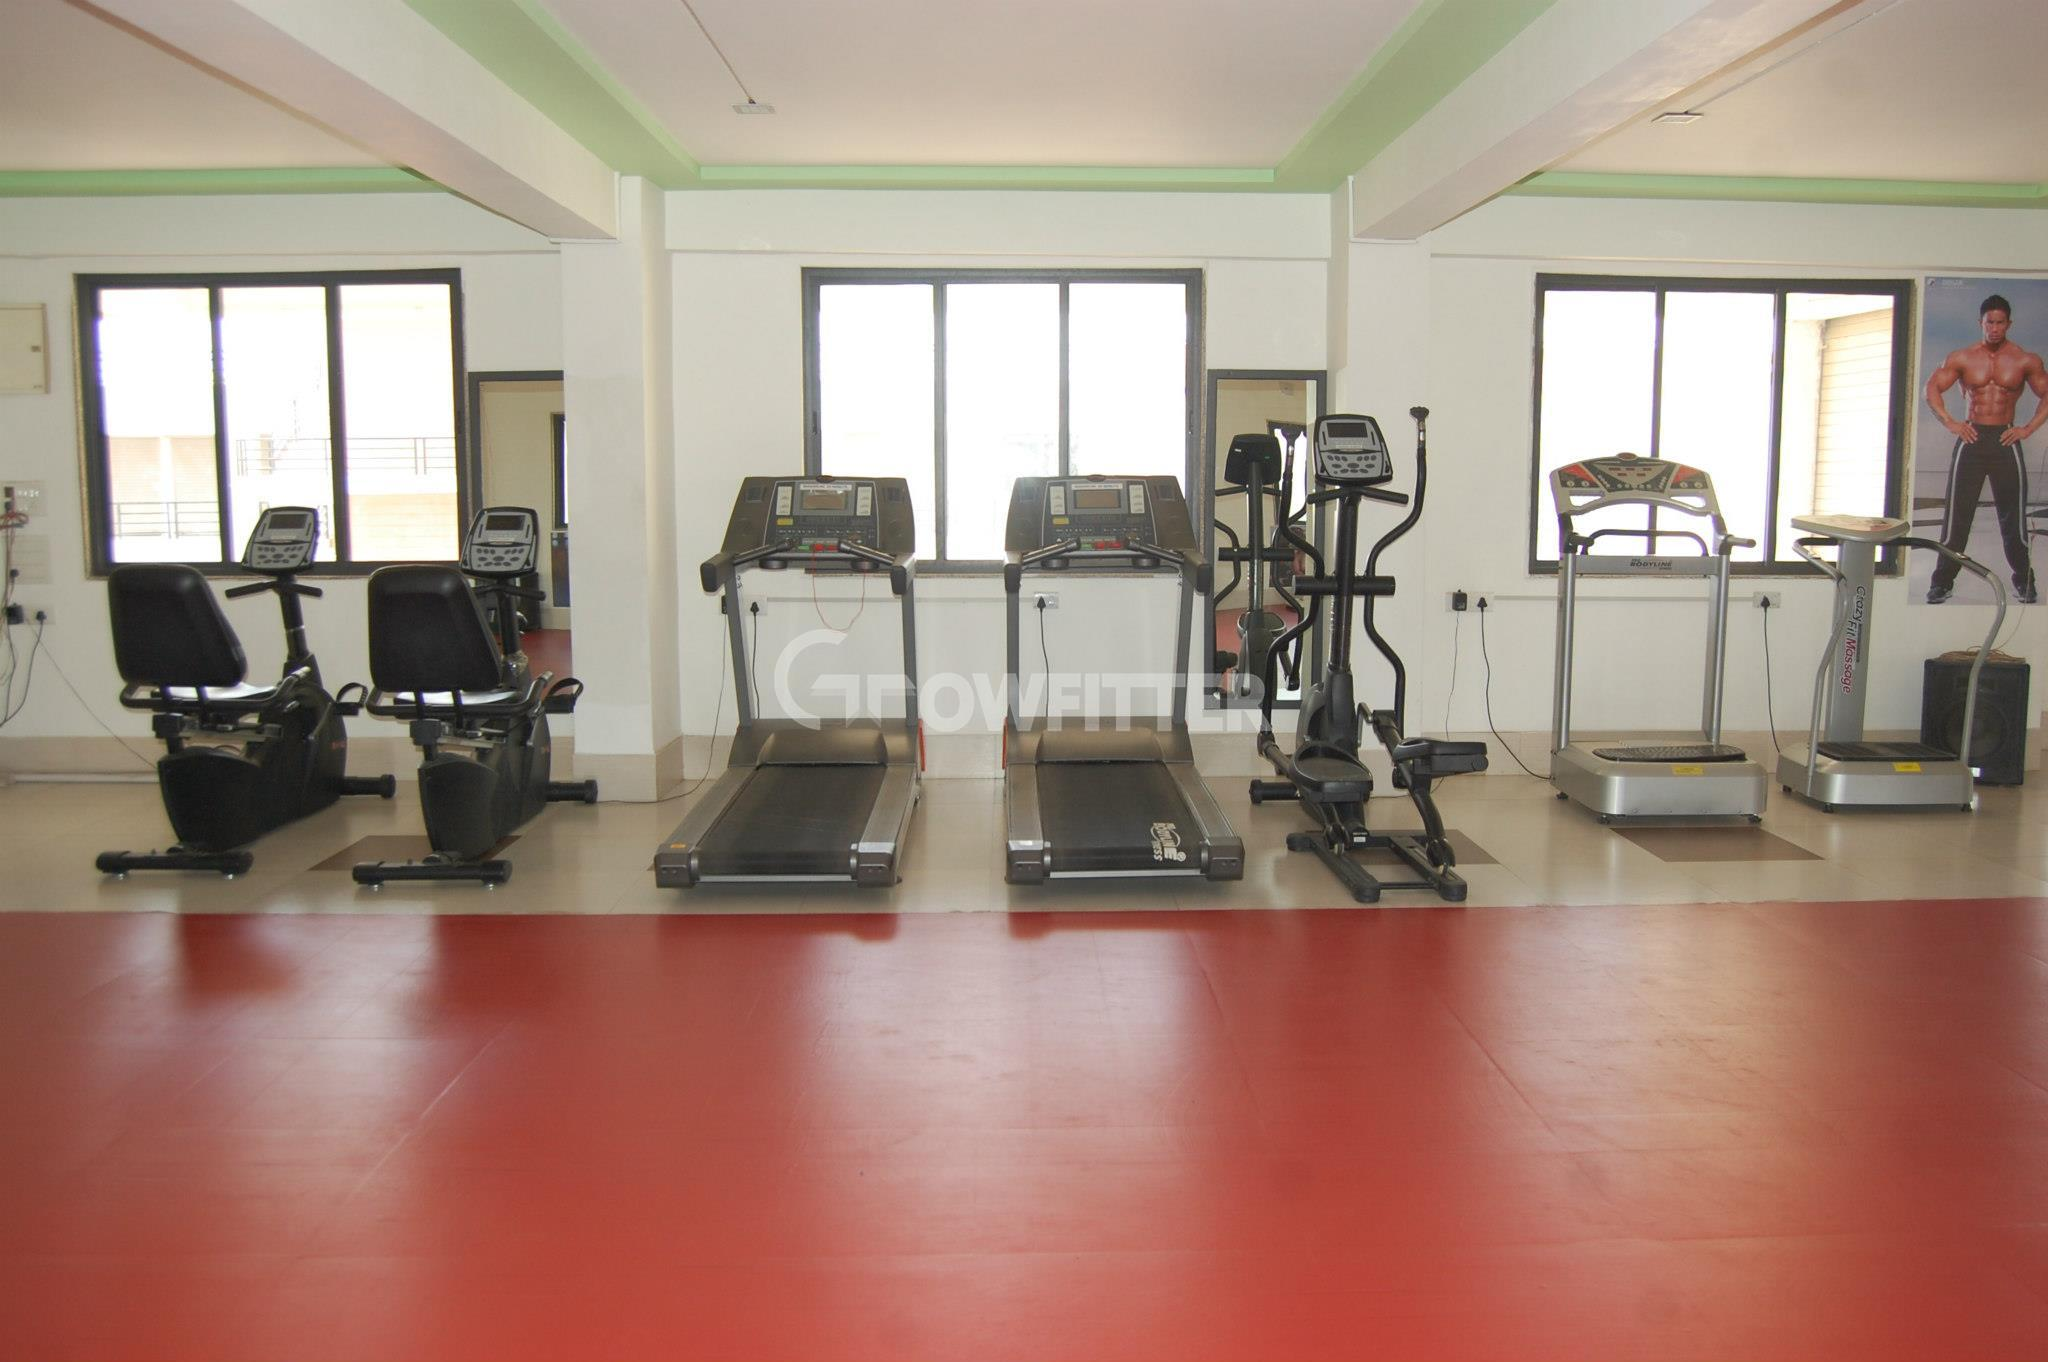 Oxygen Gym Nikol Ahmedabad Gym Membership Fees